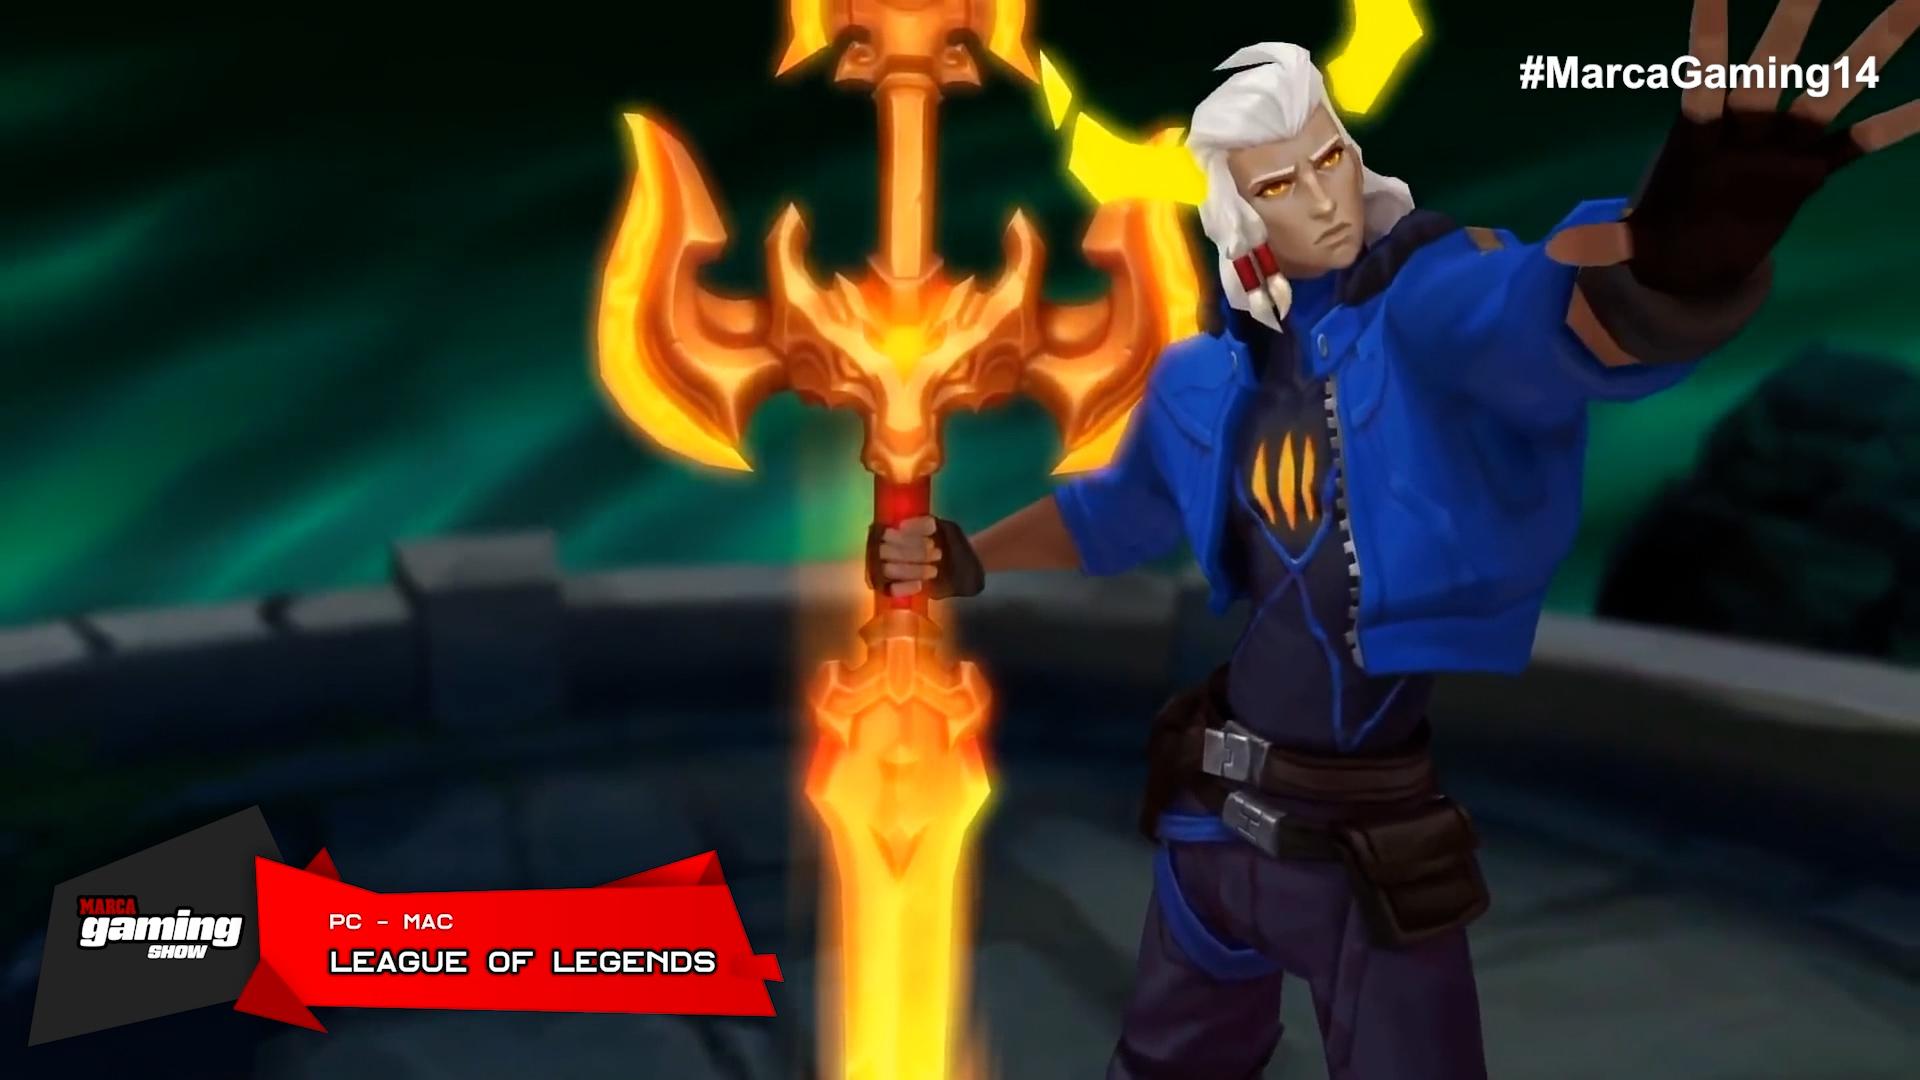 League of Legends (PC - MAC)